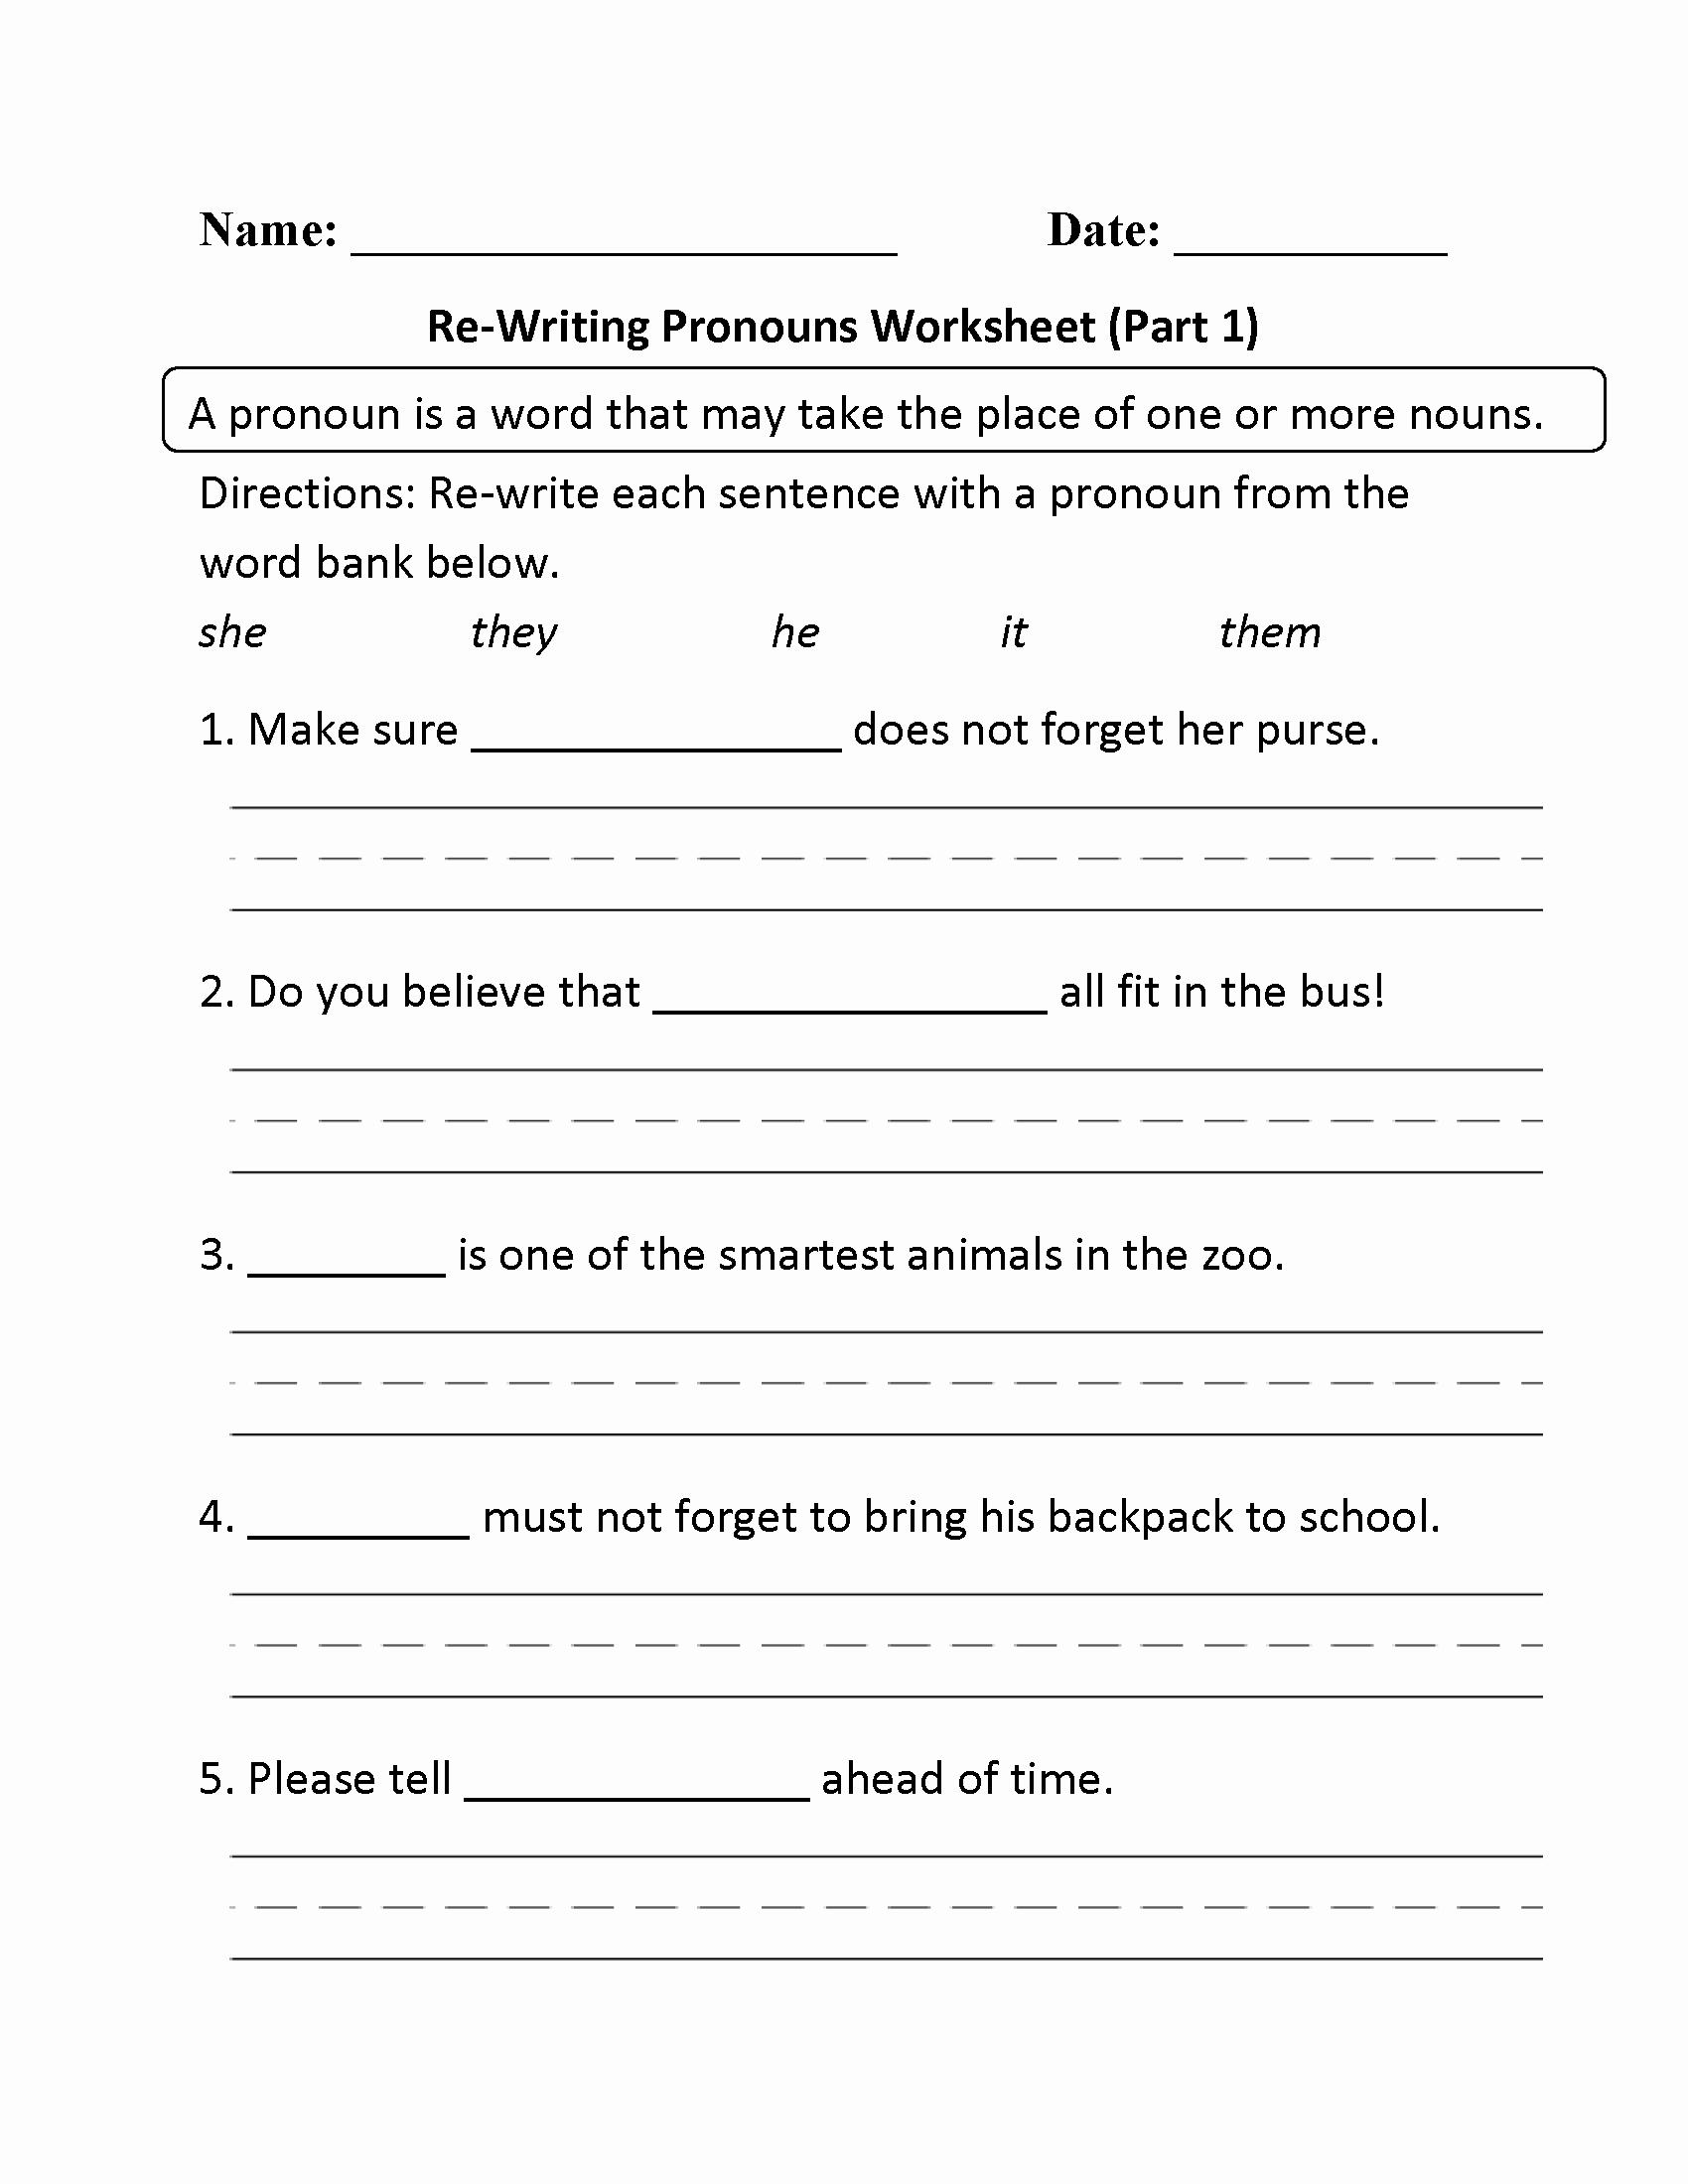 Pronoun Worksheets 2nd Grade Awesome Free Printable Pronoun Worksheets for 2nd Grade